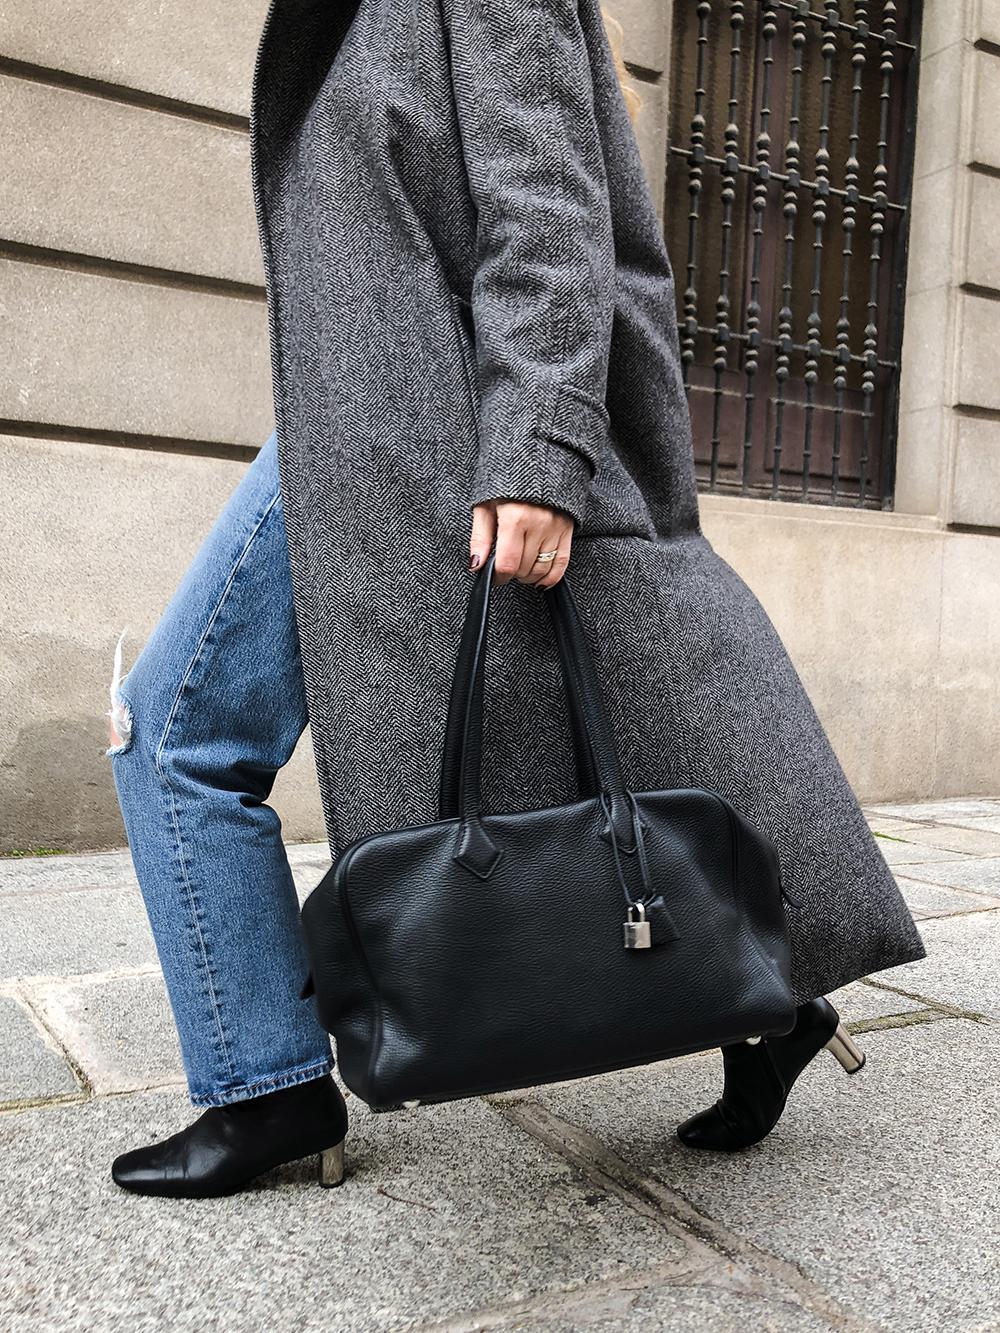 Trini | Max Mara coat Levi's jeans